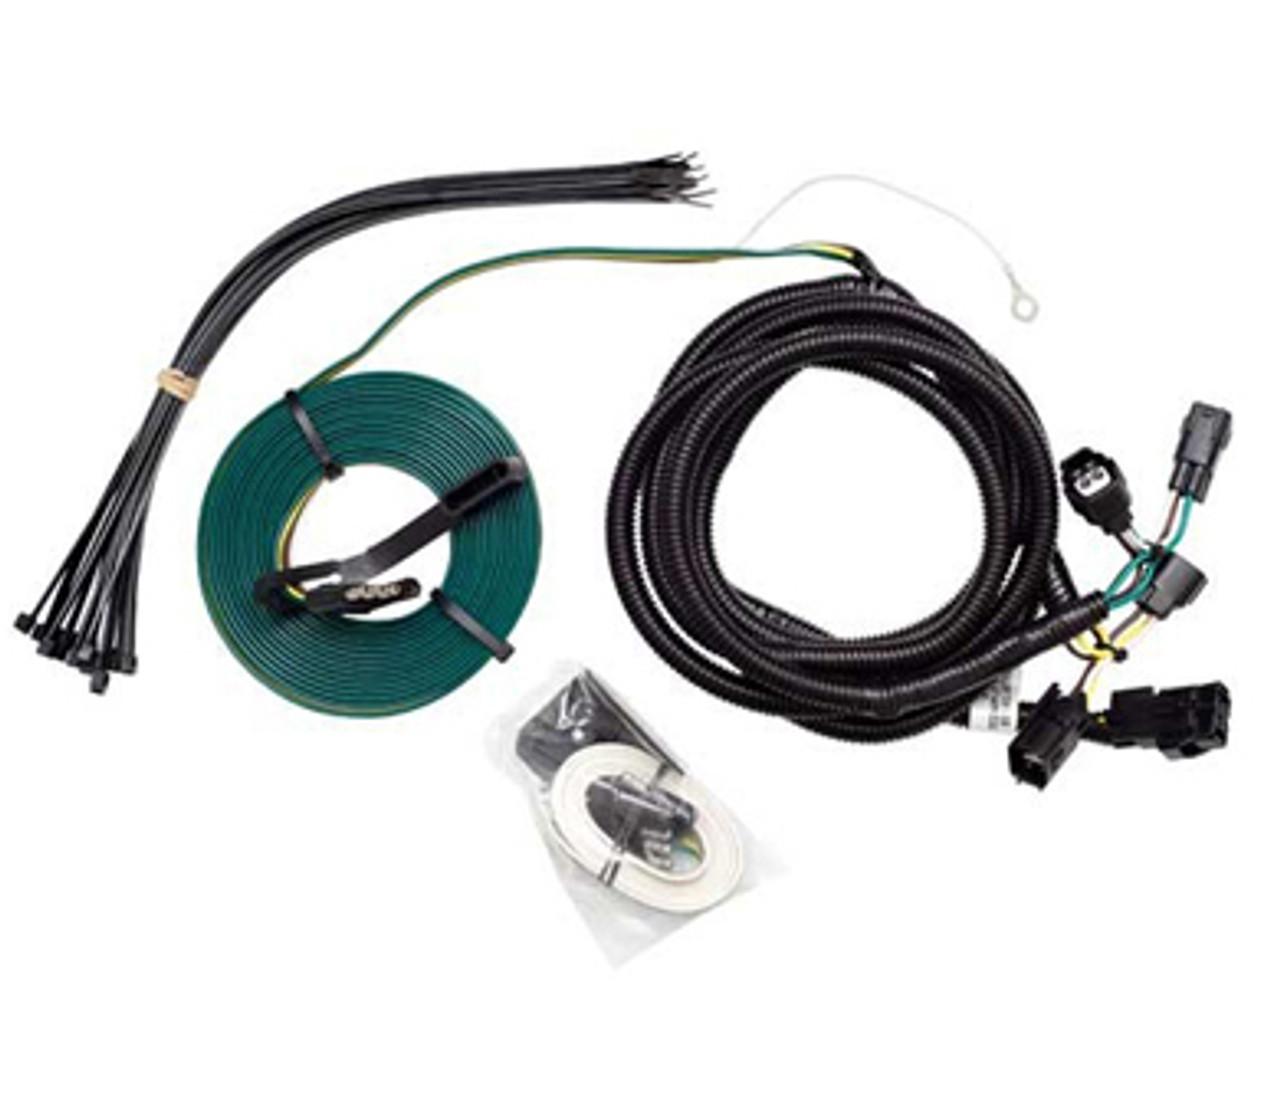 9523097 --- Demco Towed Connector - Suzuki Grand Vitara